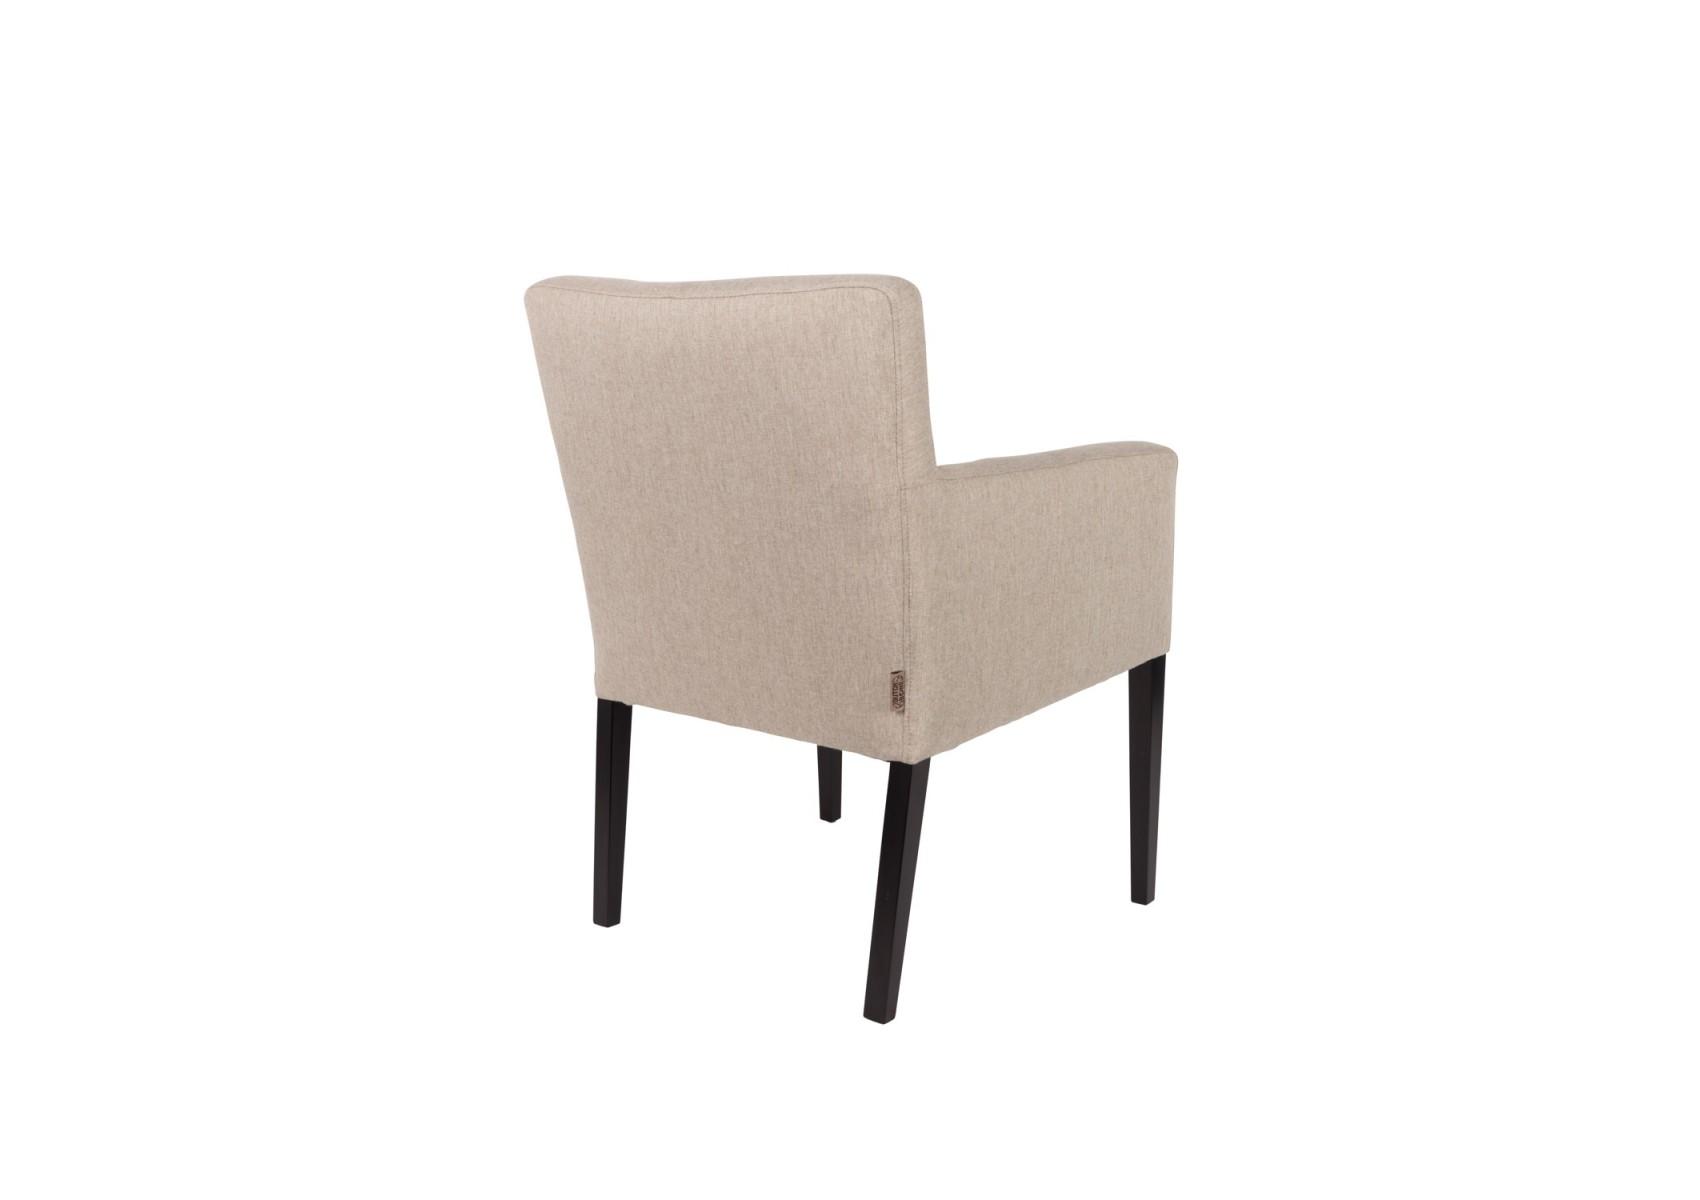 fauteuil de salon avec accoudoirs design aaron dutch bone. Black Bedroom Furniture Sets. Home Design Ideas